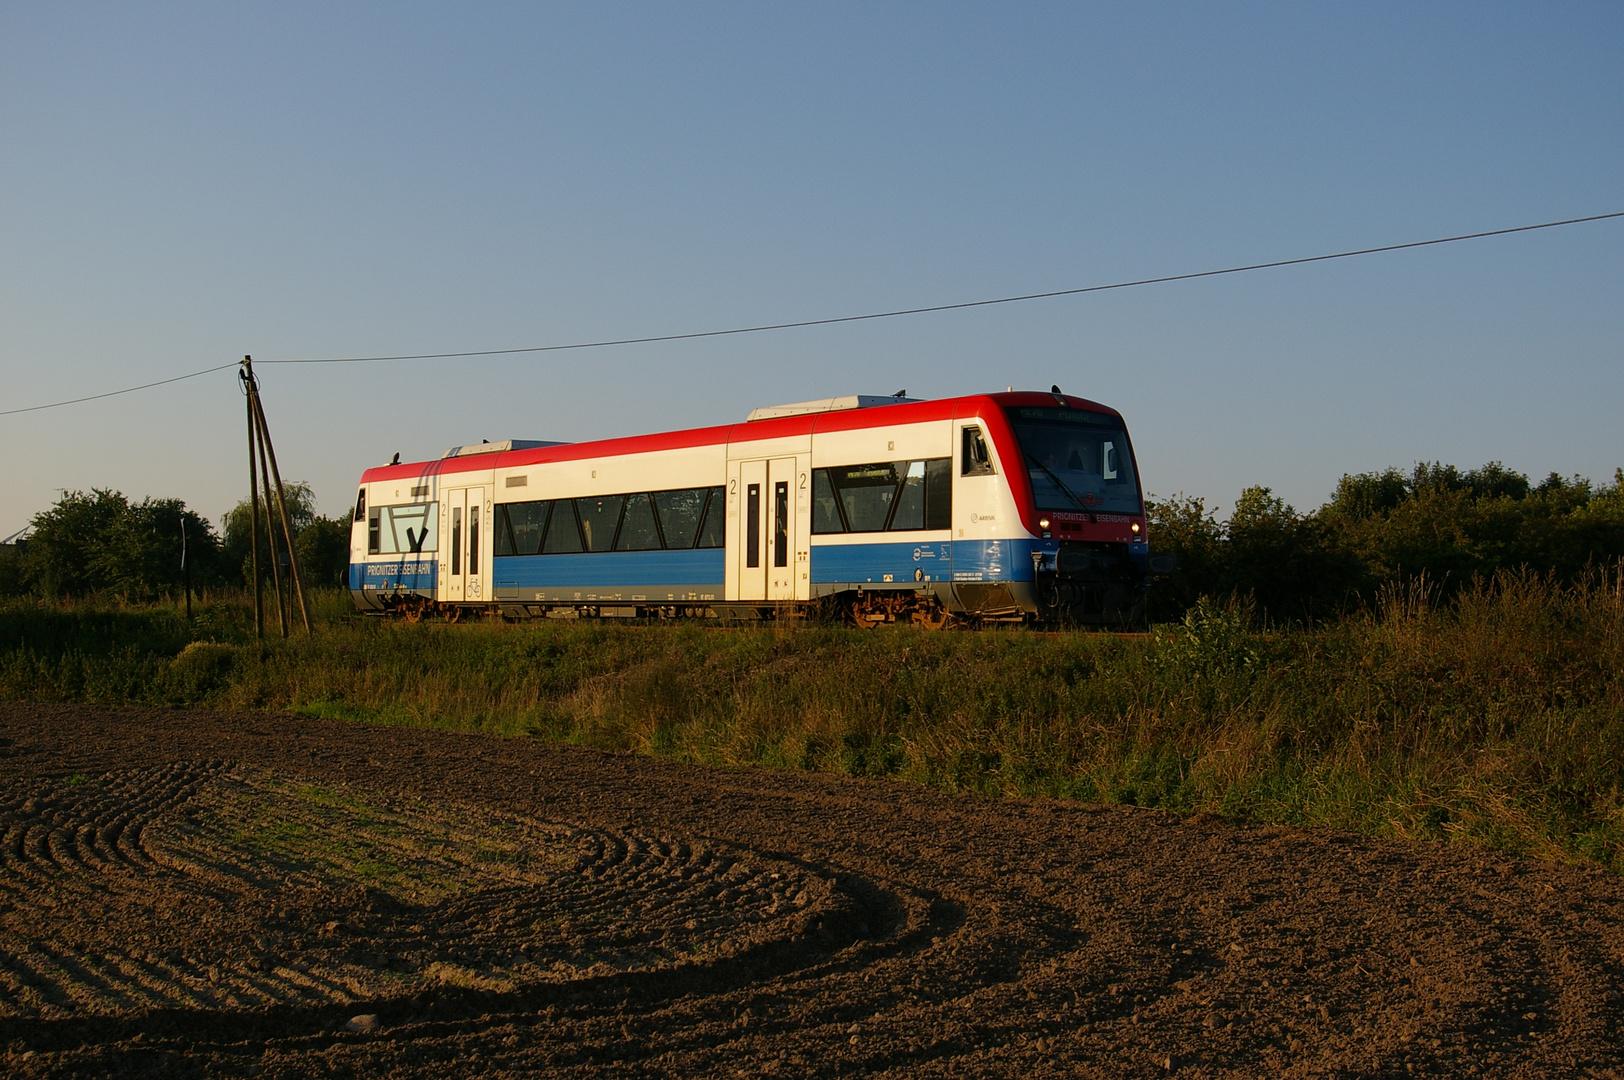 PE70 nach Putlitz bei Kuhbier am 13.09.06